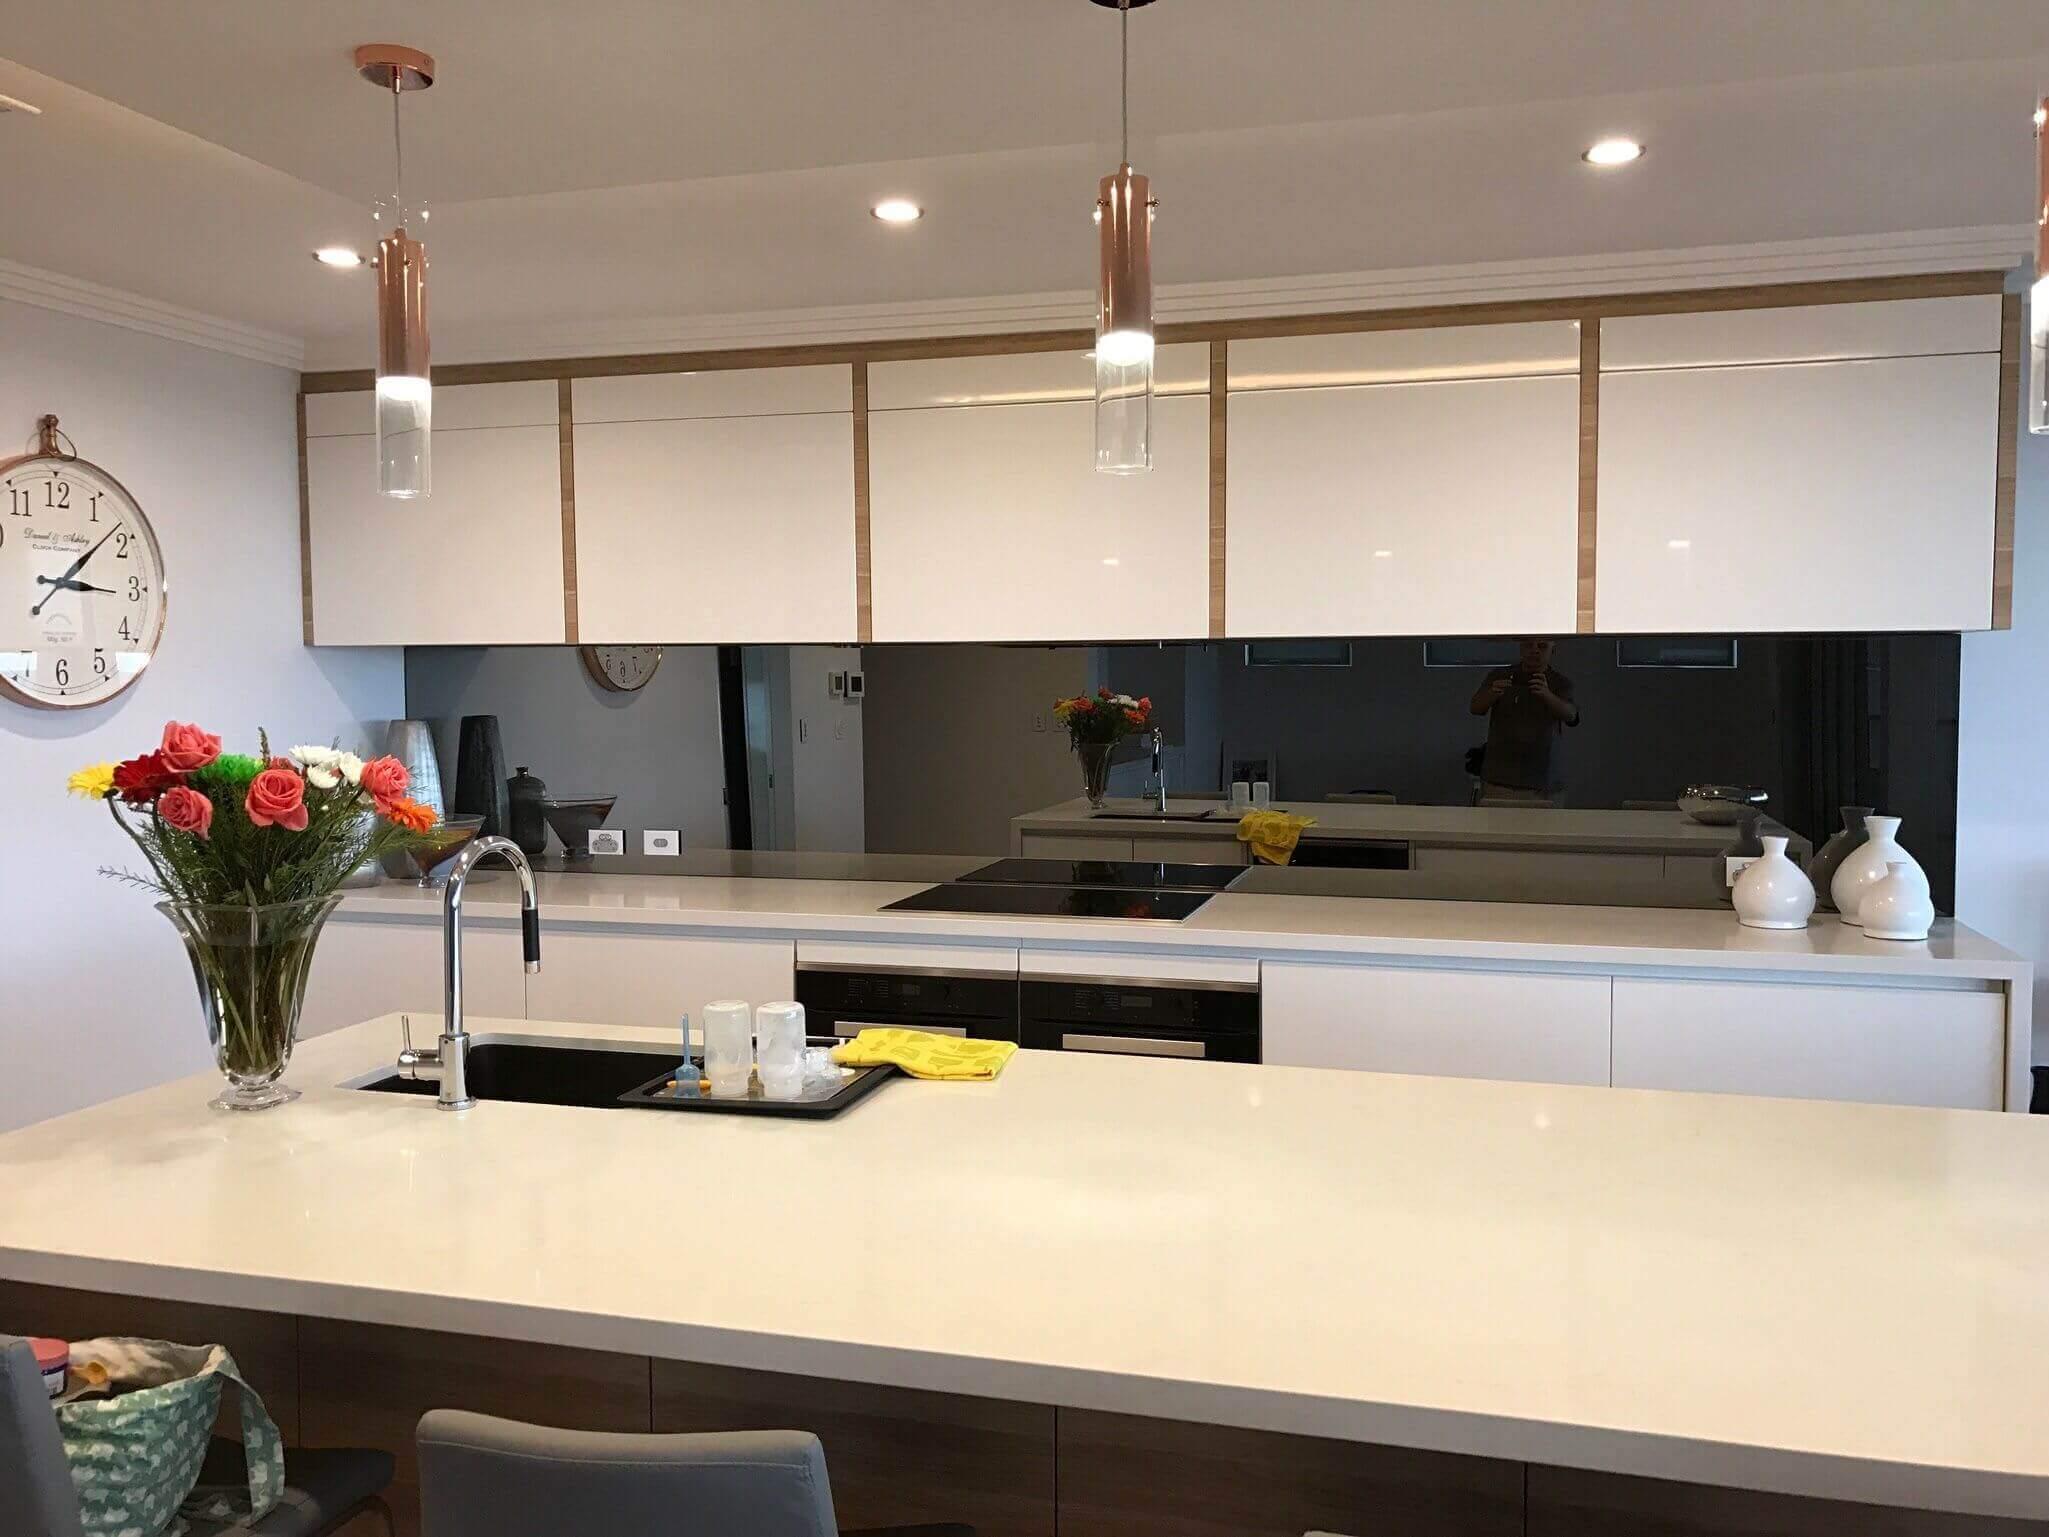 Toughened mirrored kitchen Spalshbacks